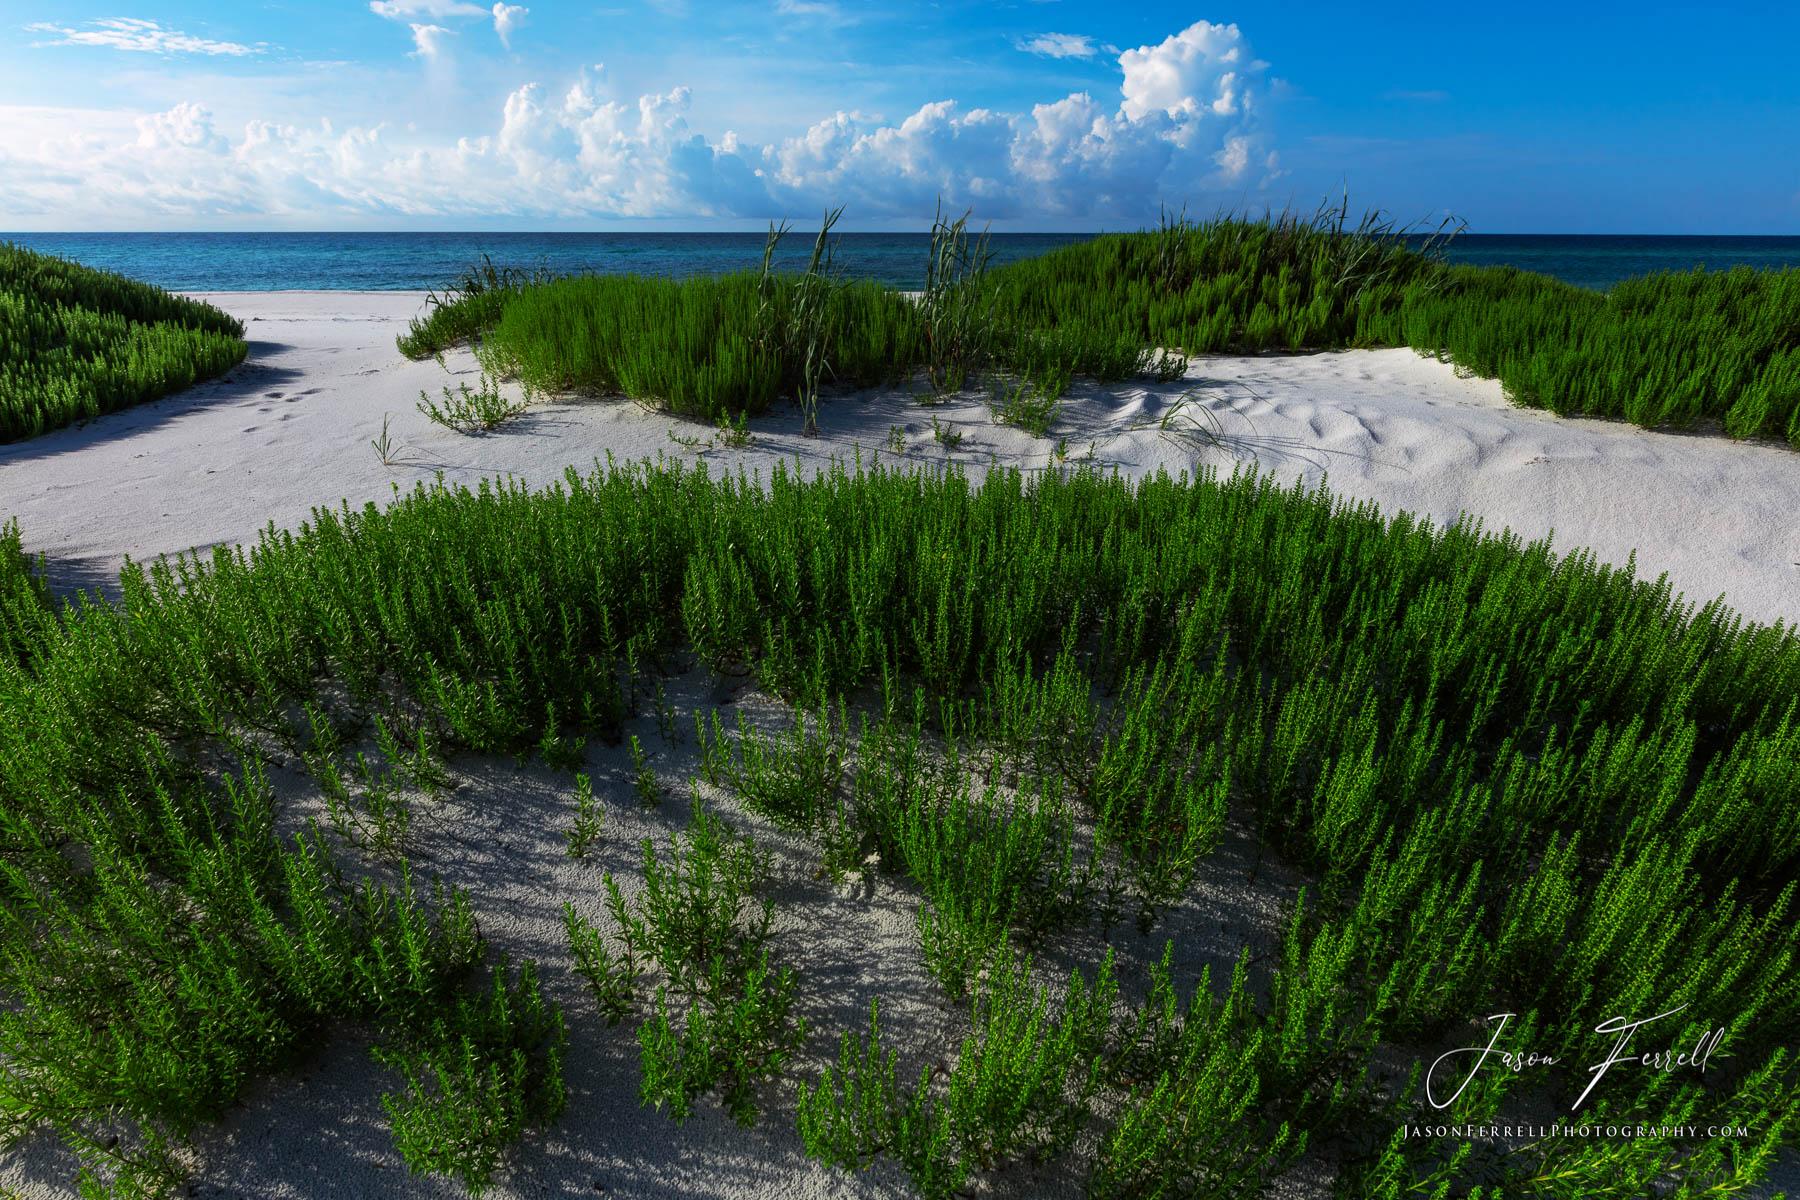 grass, sand dune, beach, water, gulf of mexico, sky, blue, green, white, gulf islands national seashore, santa rosa island, photo